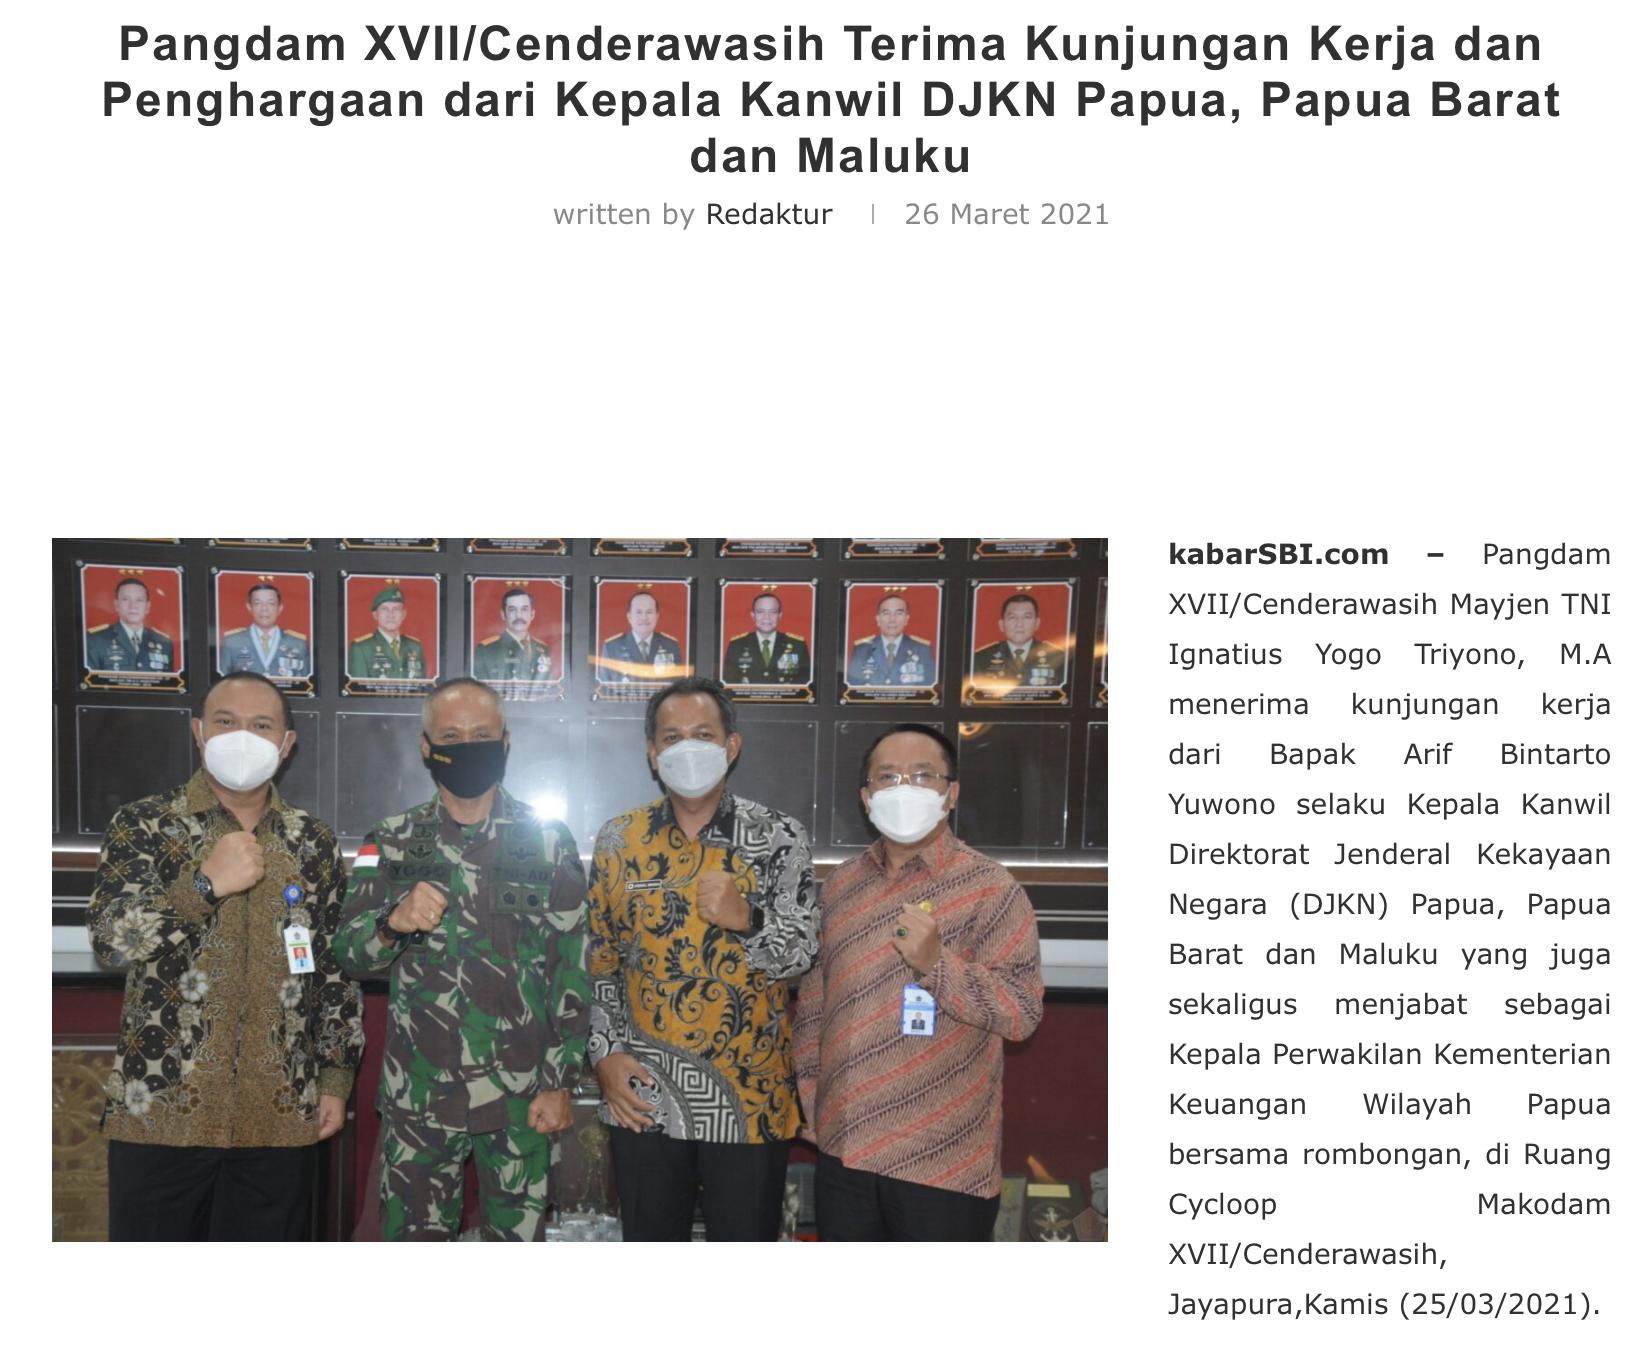 Pangdam XVII/Cenderawasih Terima Kunjungan Kerja dan Penghargaan dari Kepala Kanwil DJKN Papua, Papua Barat dan Maluku